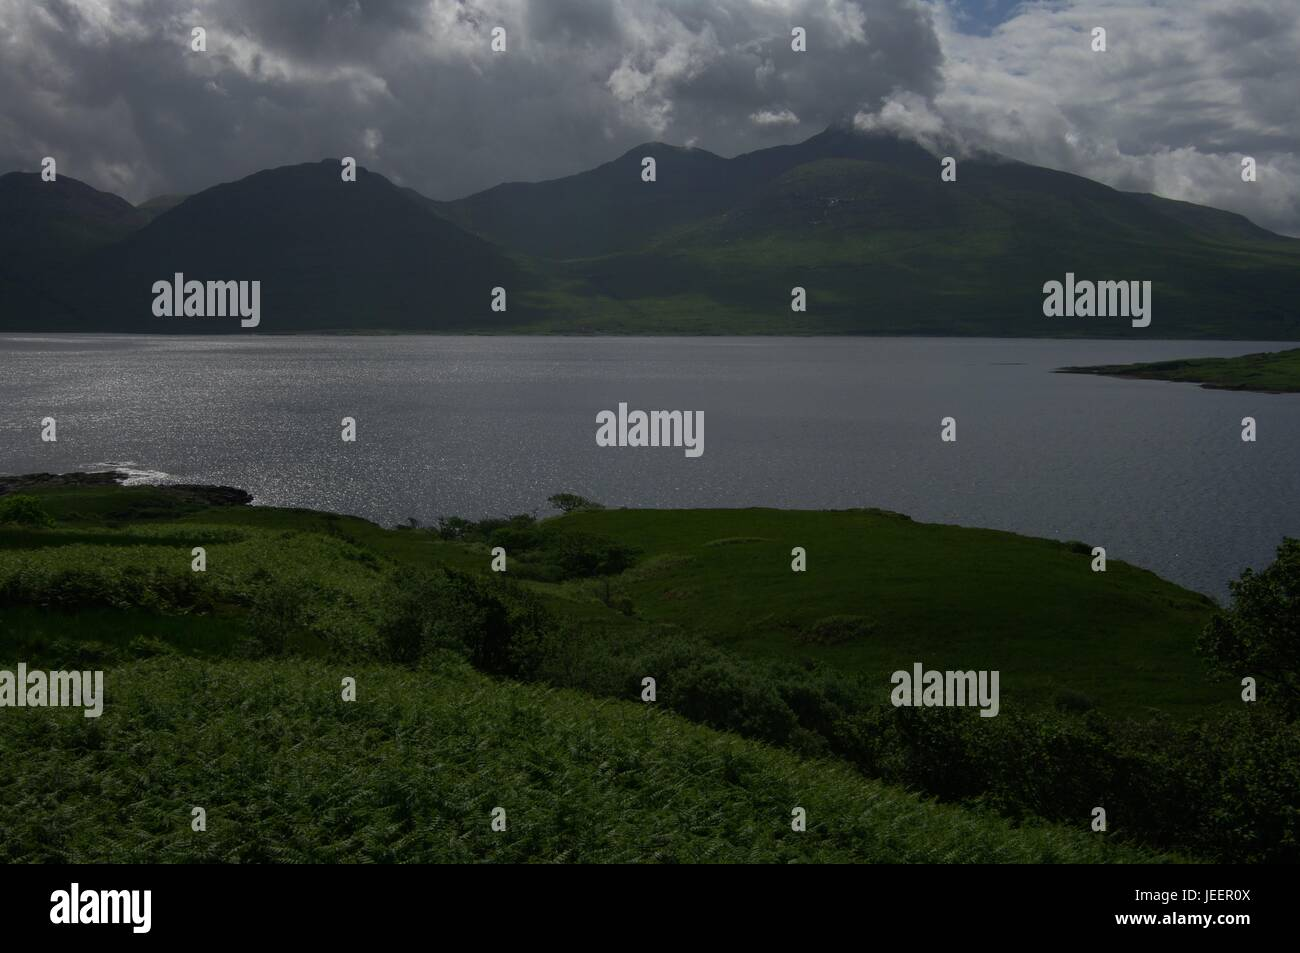 Isle of Mull mountains, Argyll and Bute, Scotland - Stock Image